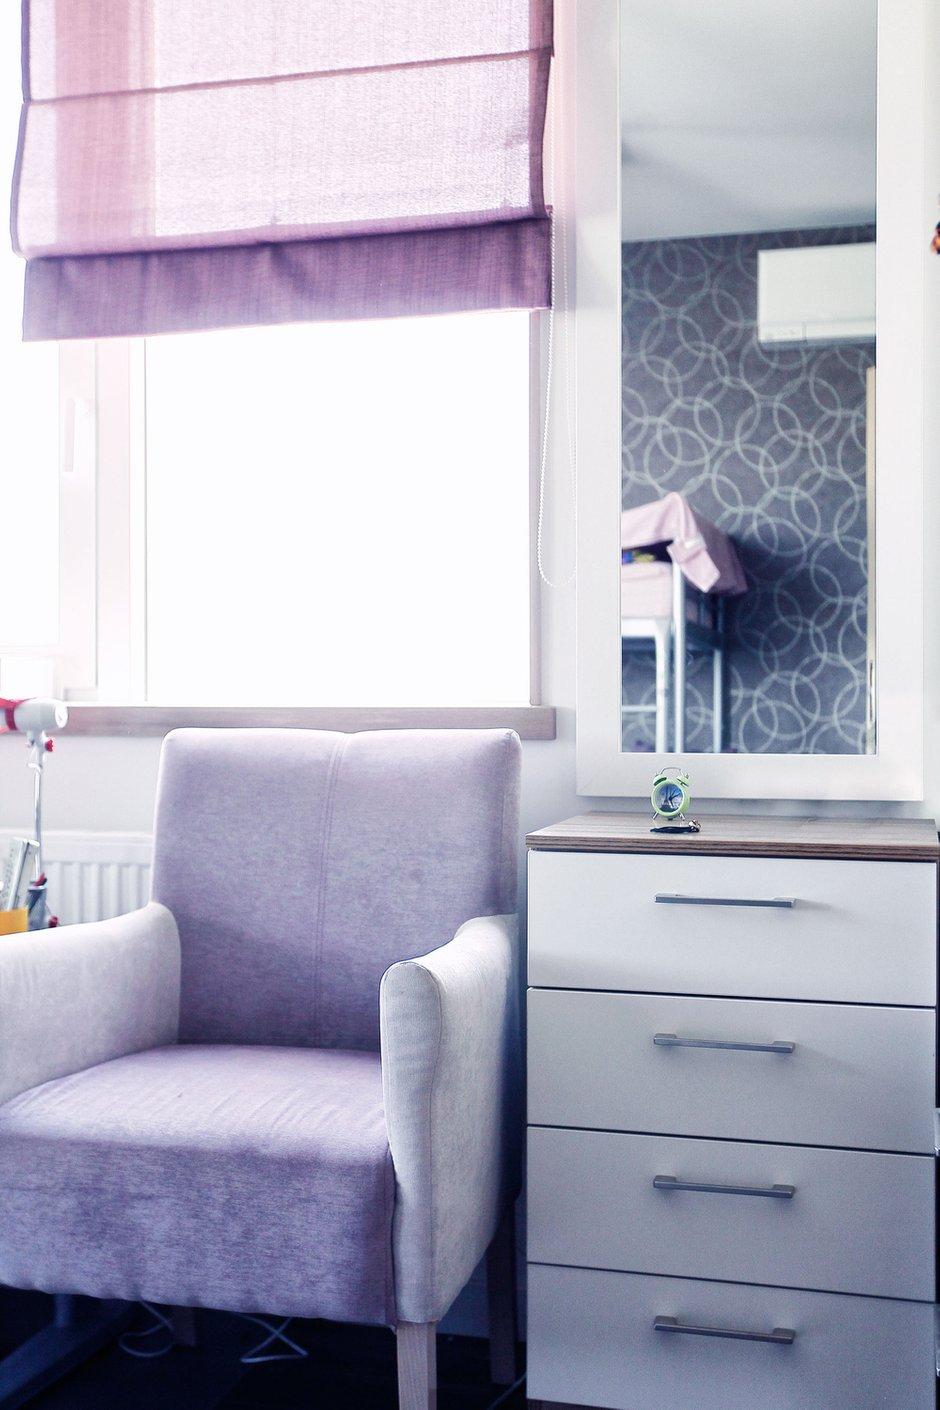 Фотография: Мебель и свет в стиле Прованс и Кантри, Квартира, Текстиль, Декор, Дома и квартиры, IKEA, Проект недели, Москва – фото на INMYROOM